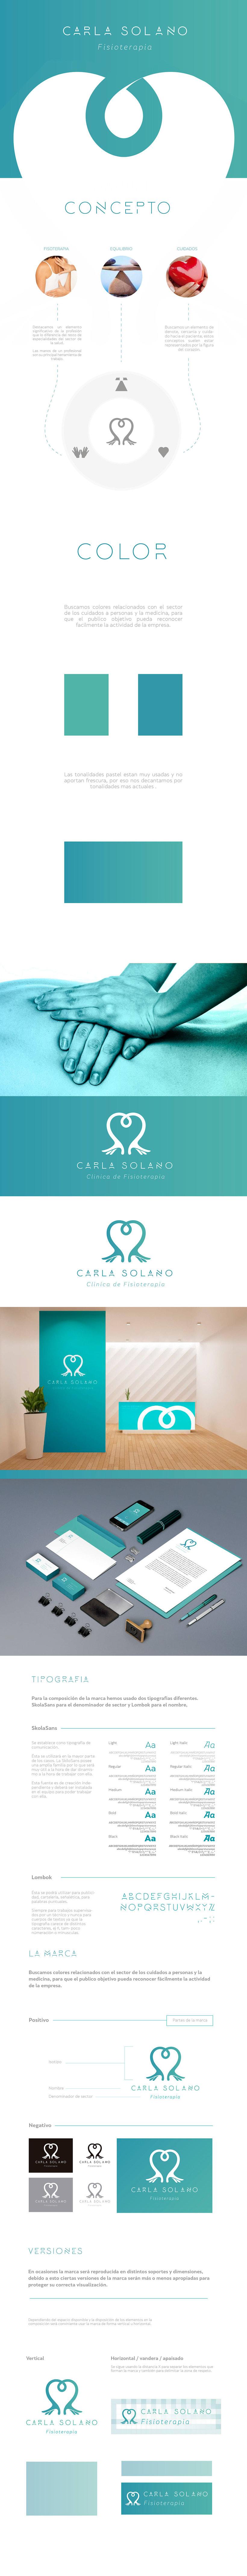 CARLA SOLANO, Identidad Corporativo / Brand BookNuevo proyecto 0